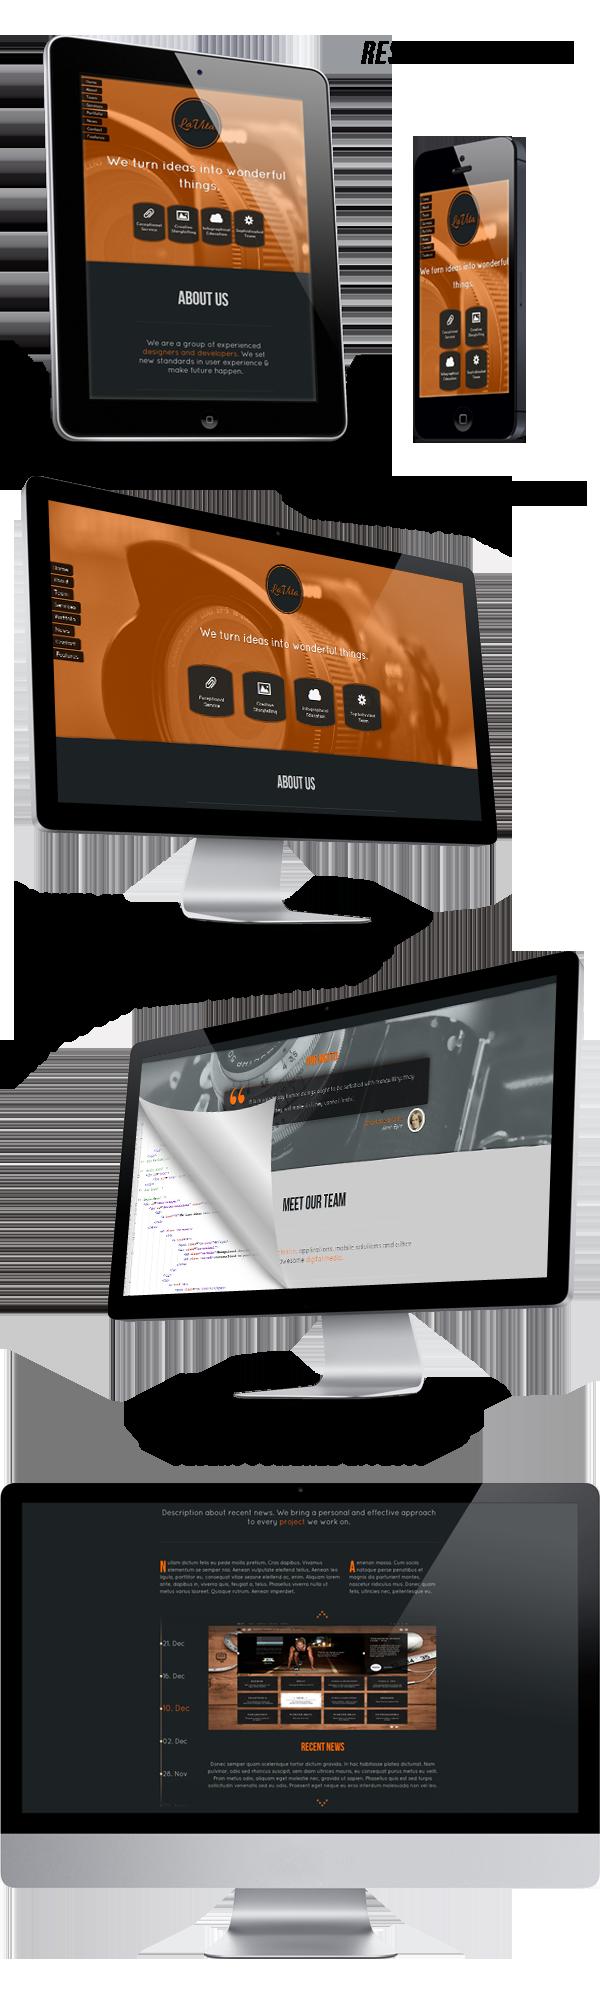 LaVita - Creative One Page HTML5 Template